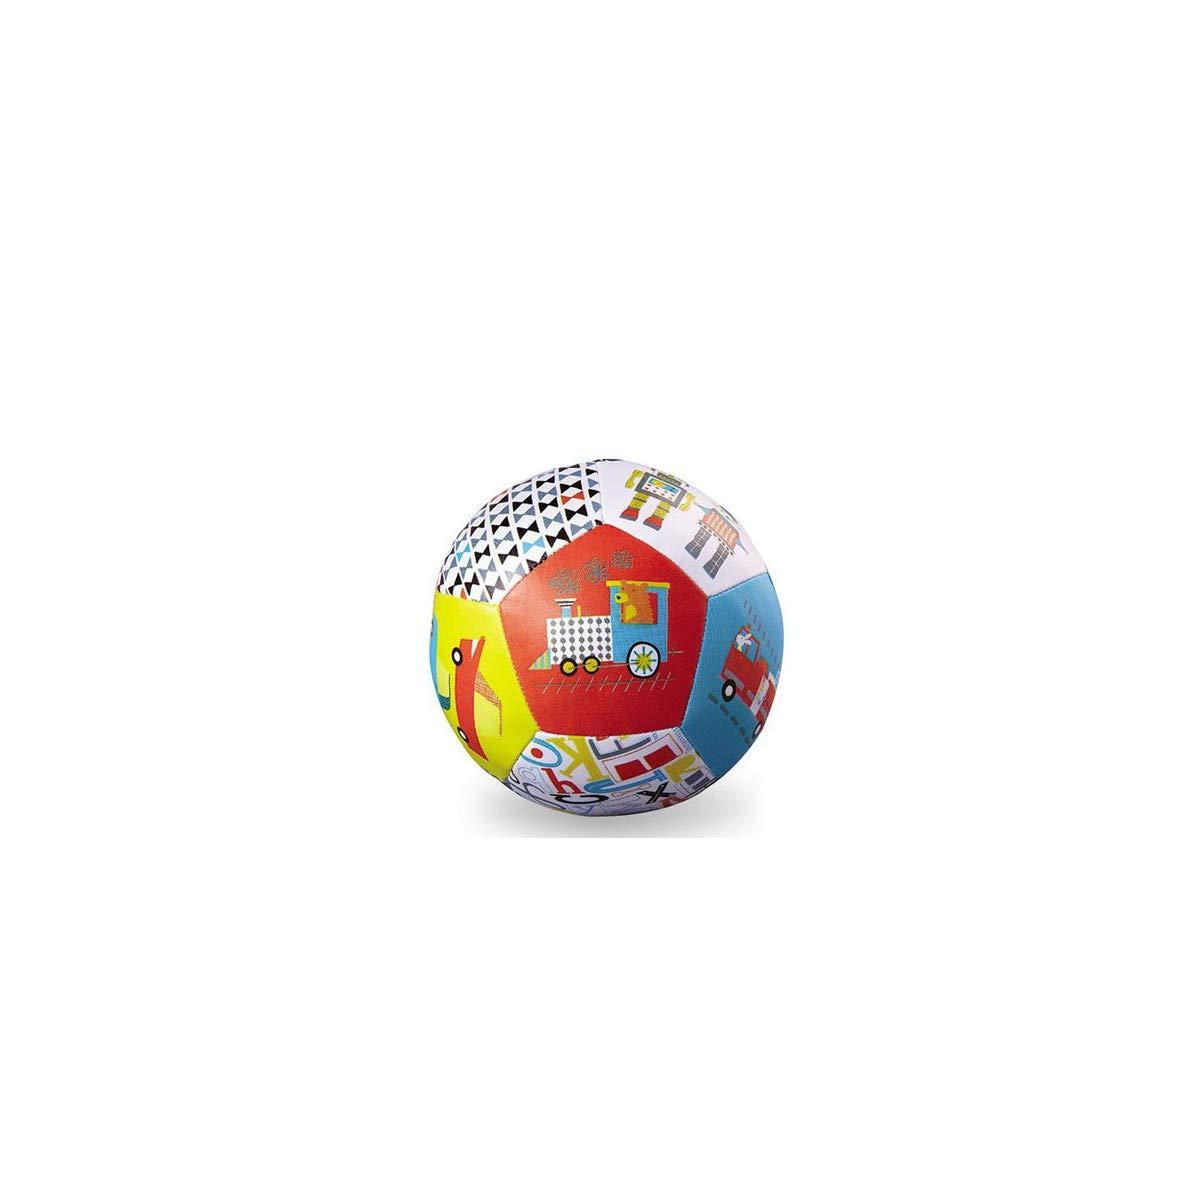 Crocodile Creek–Balloon Baby kid' S World, 2300-1